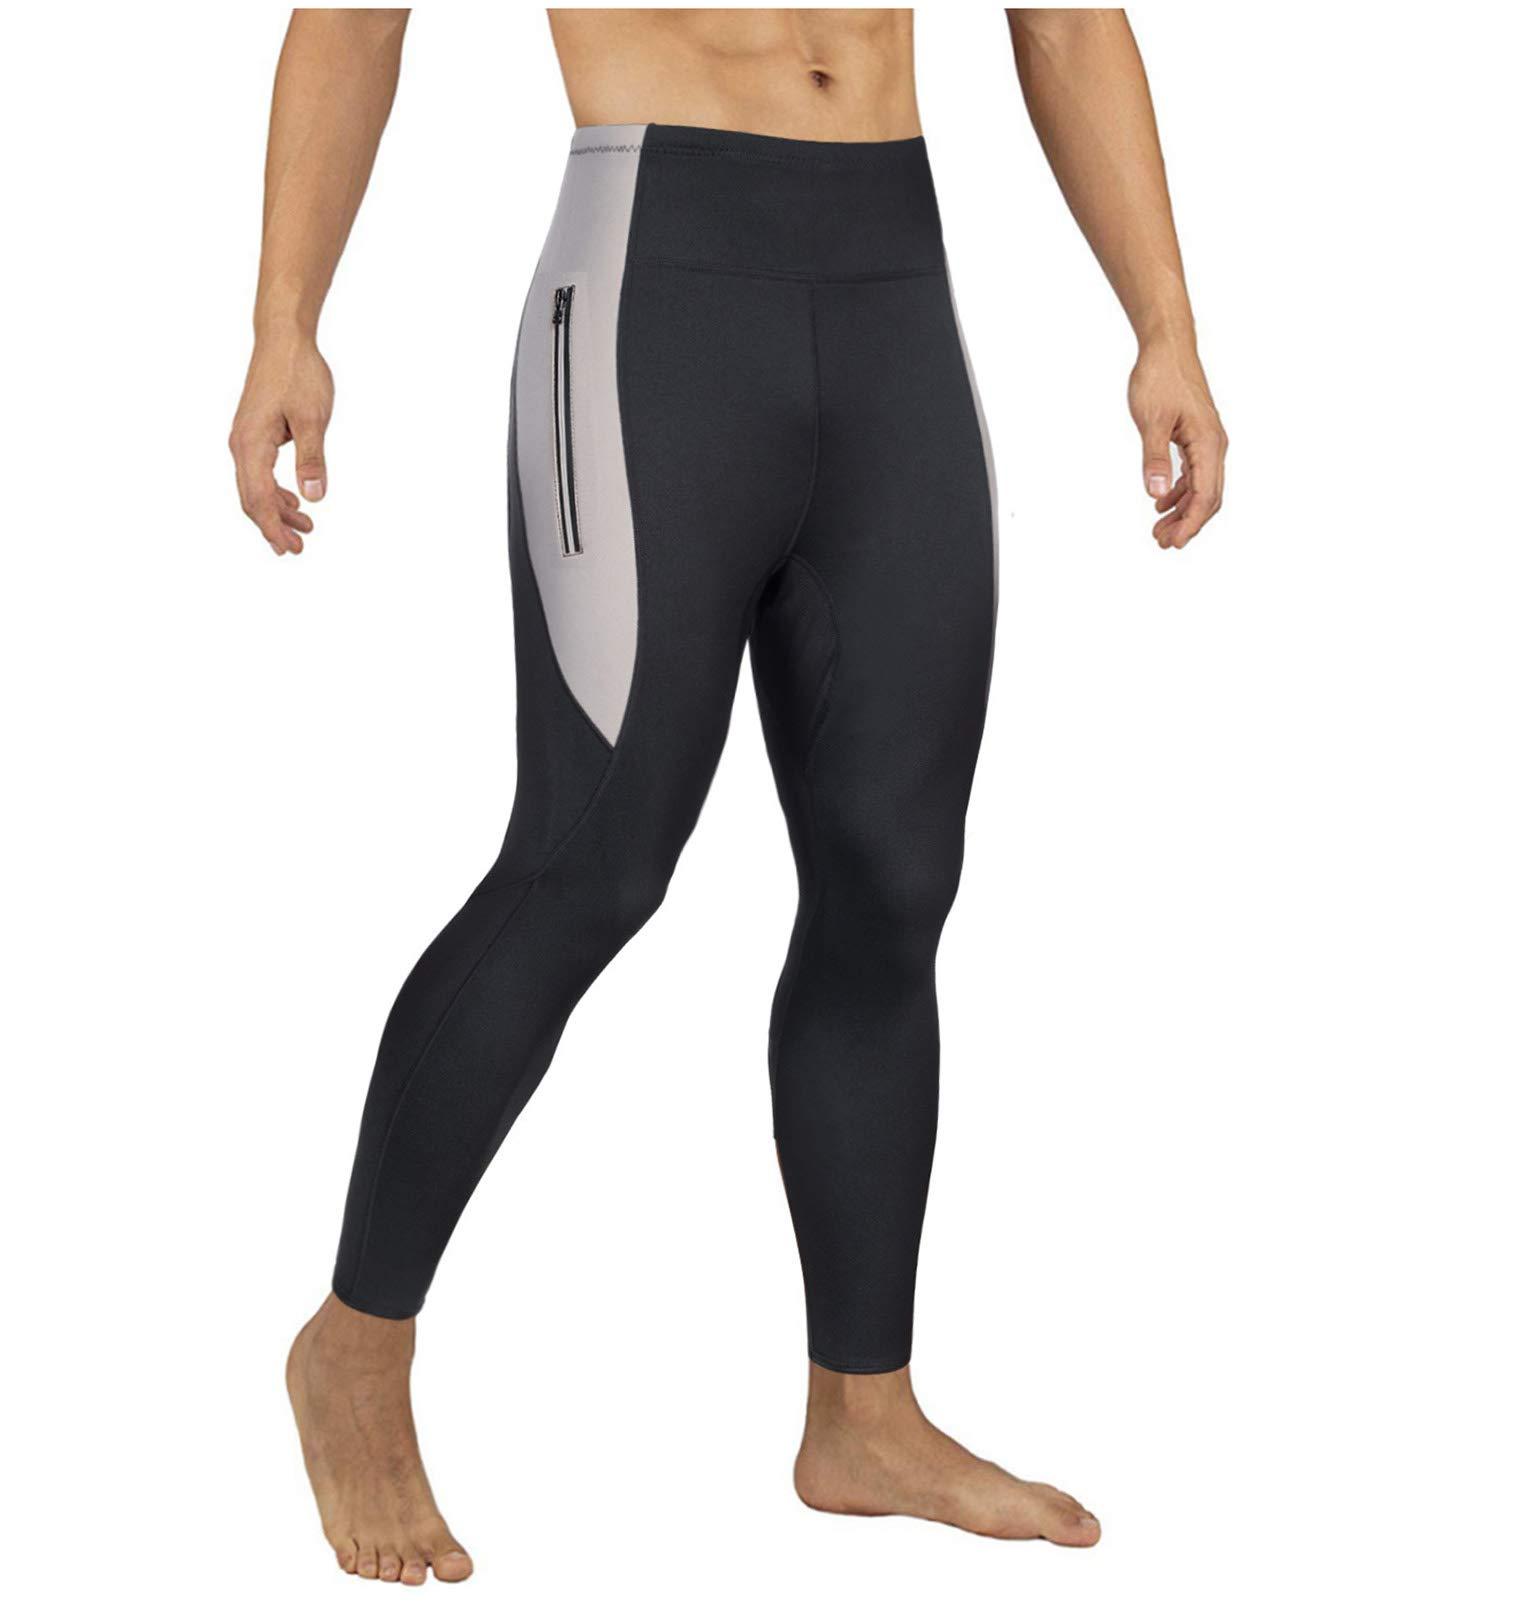 Mens Hot Slimming Sauna Pants for Weight Loss Neoprene Body Shapers Sweat Workout Capri Leggings Black